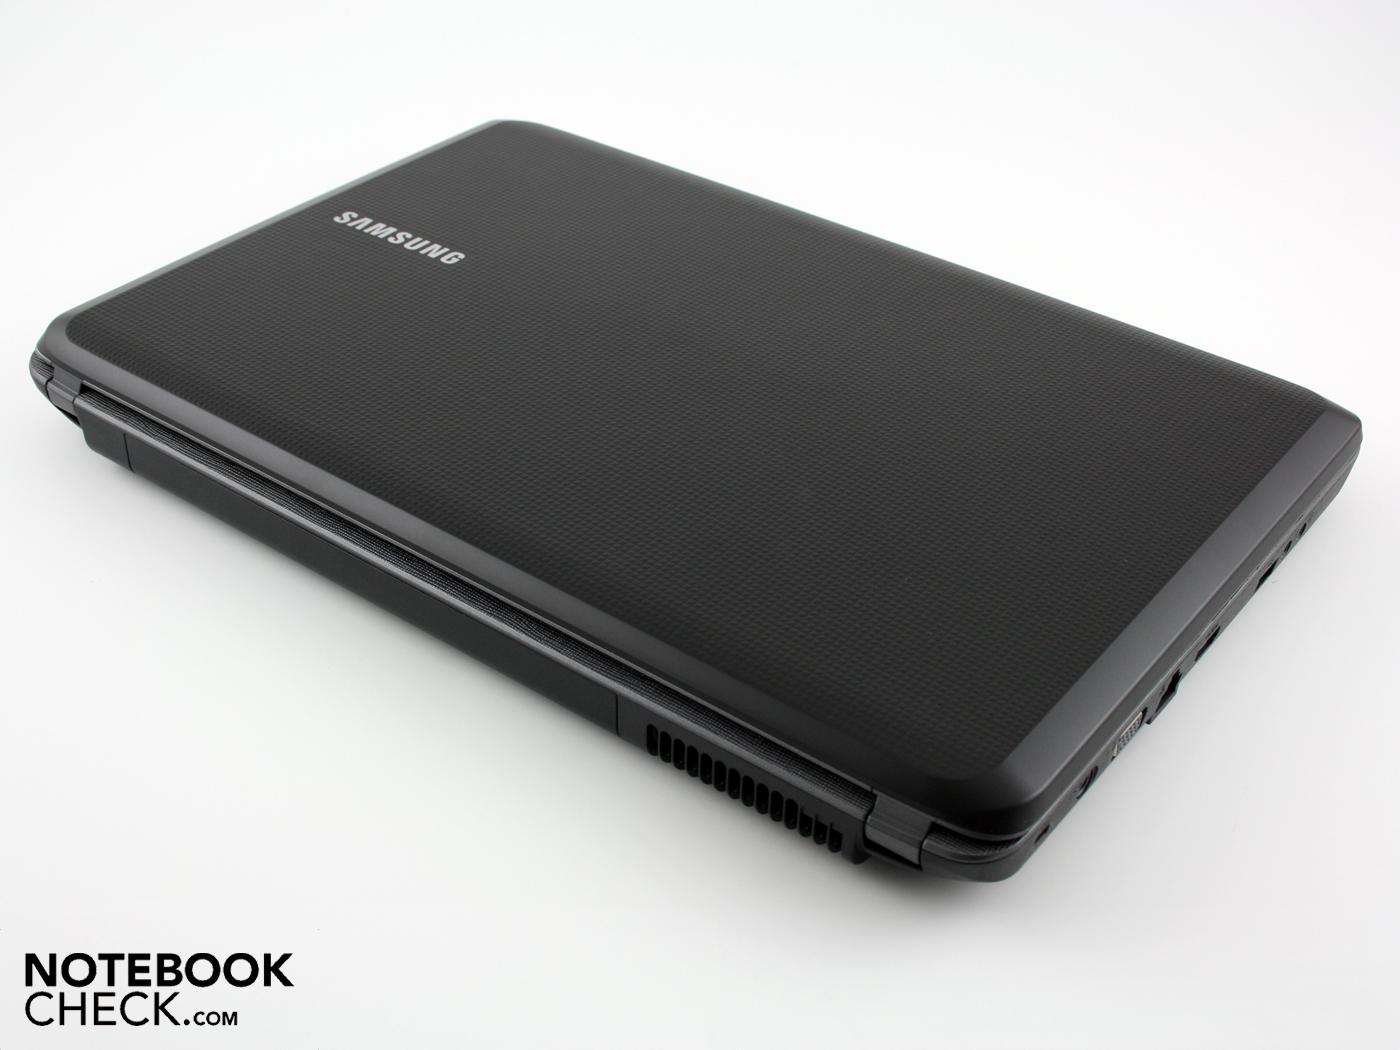 samsung r530 serisi notebook - photo #45